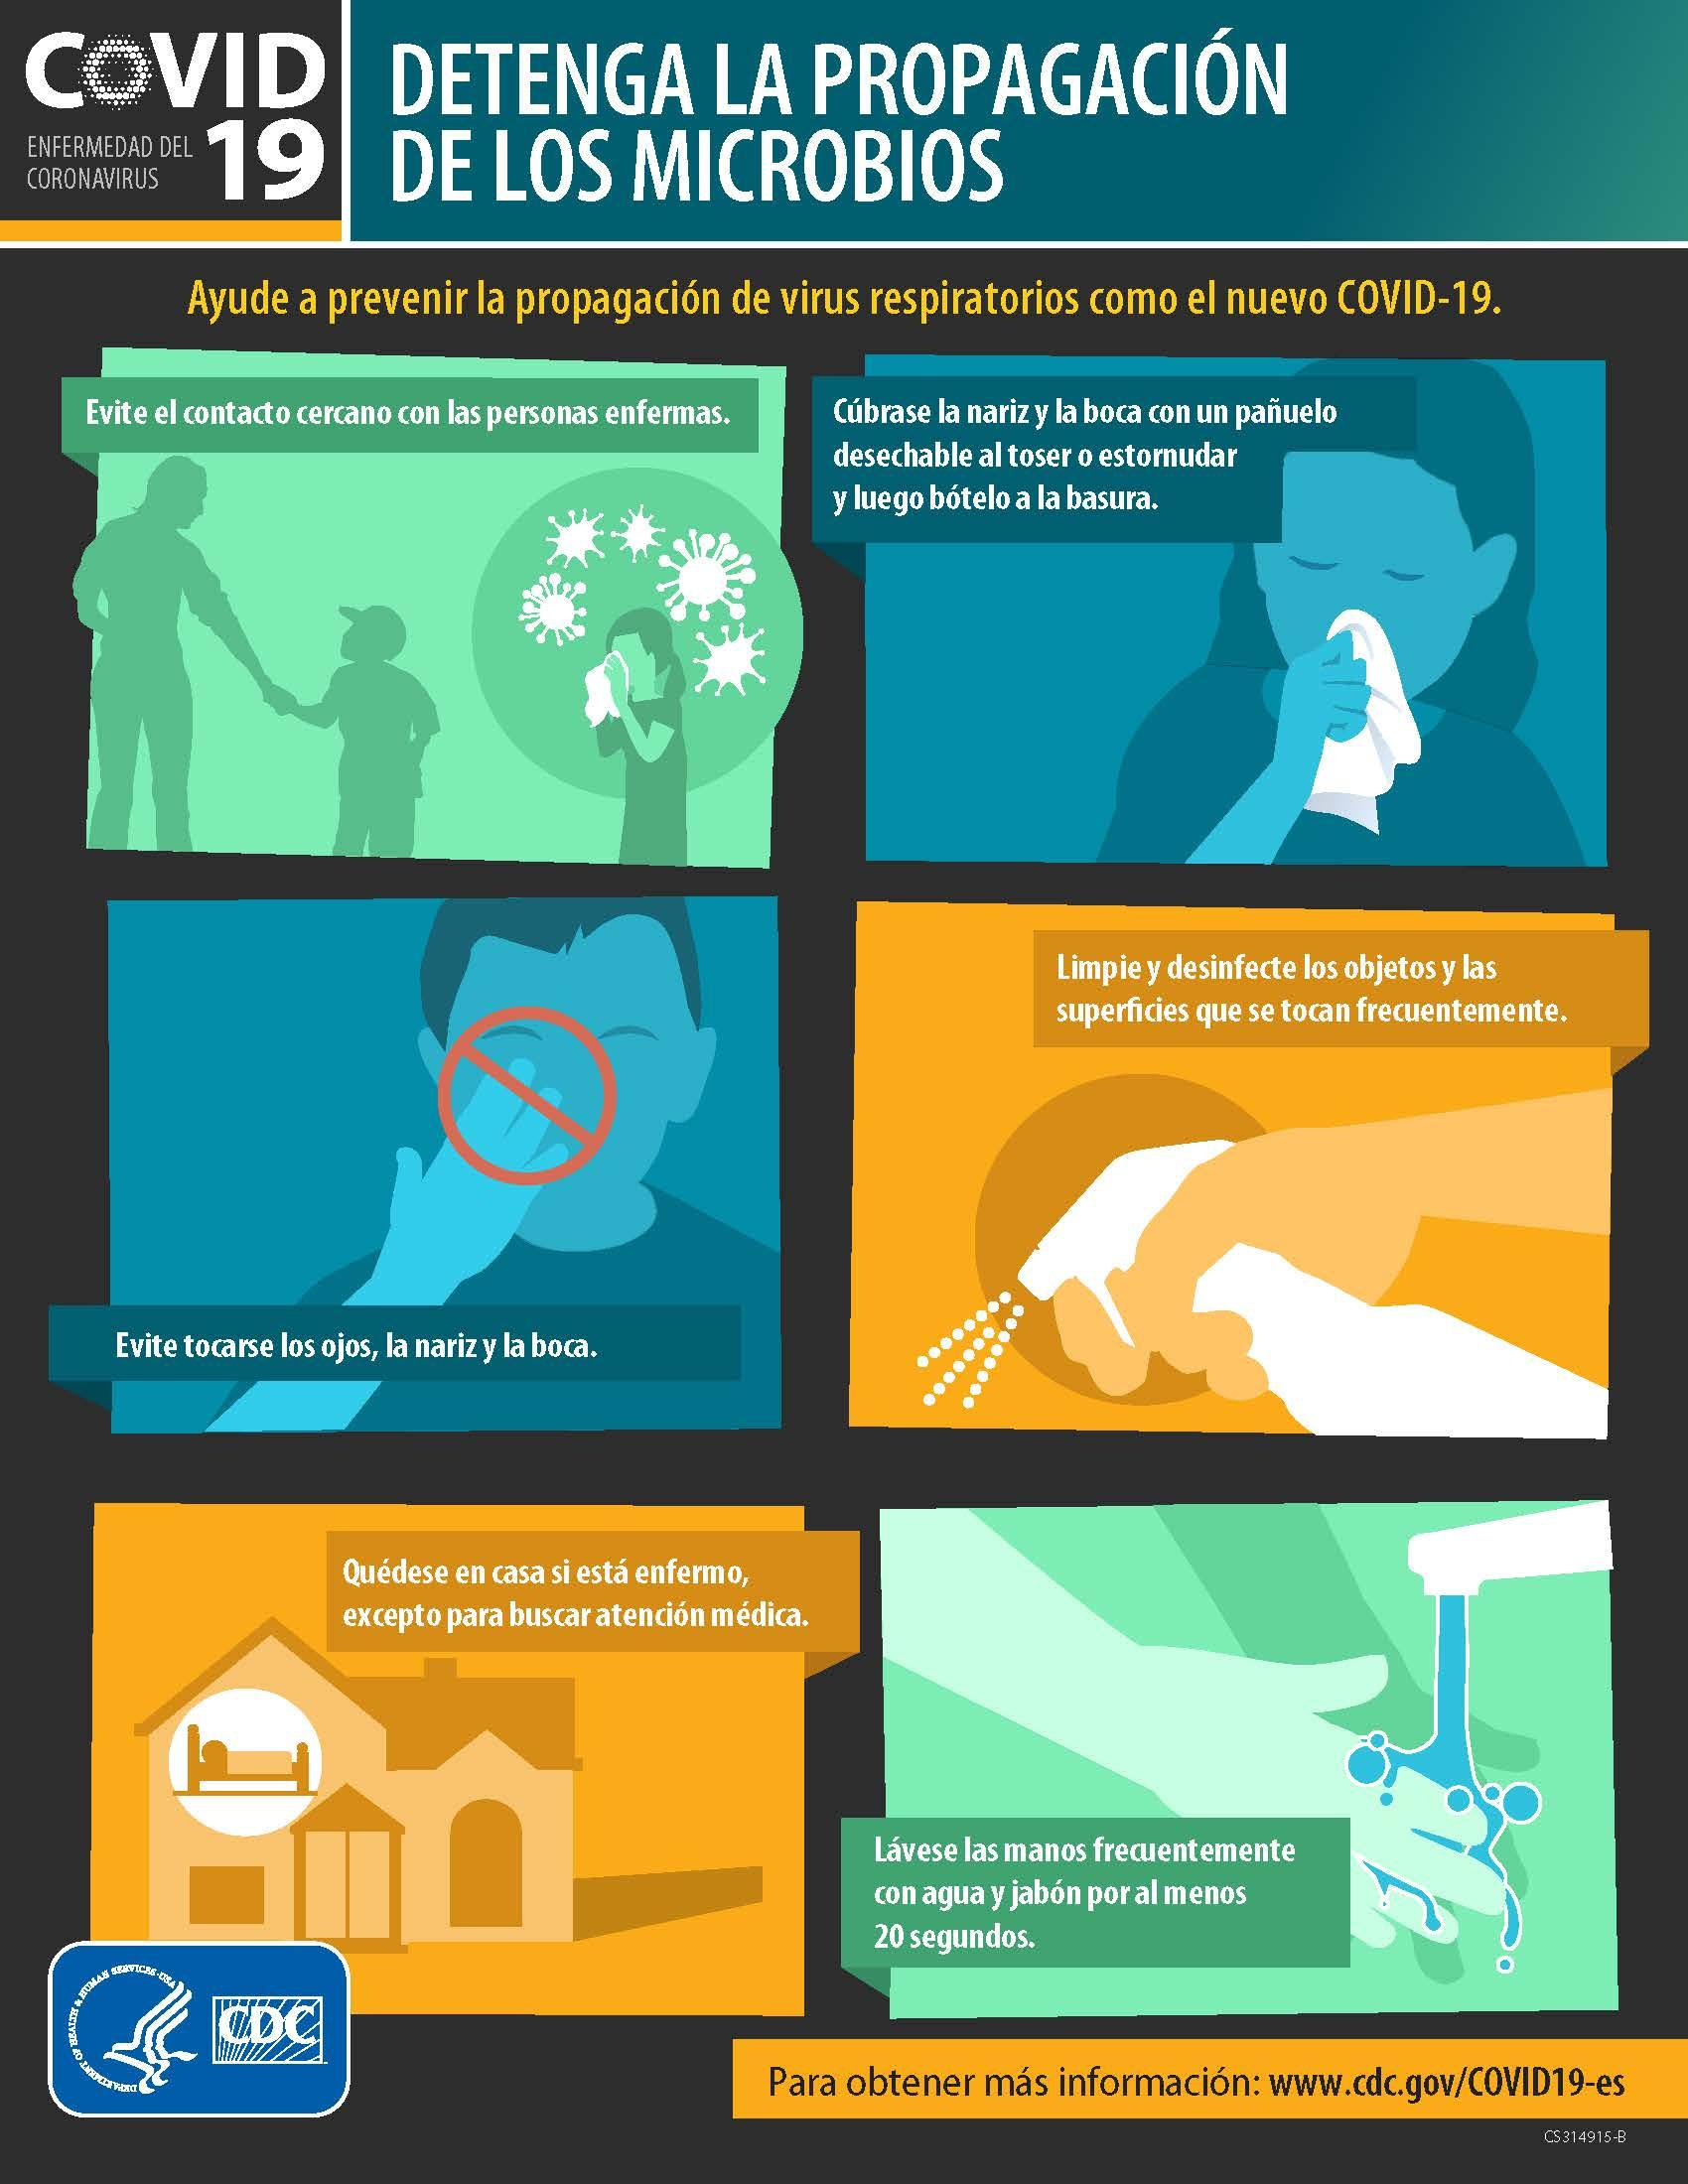 infographic spanish